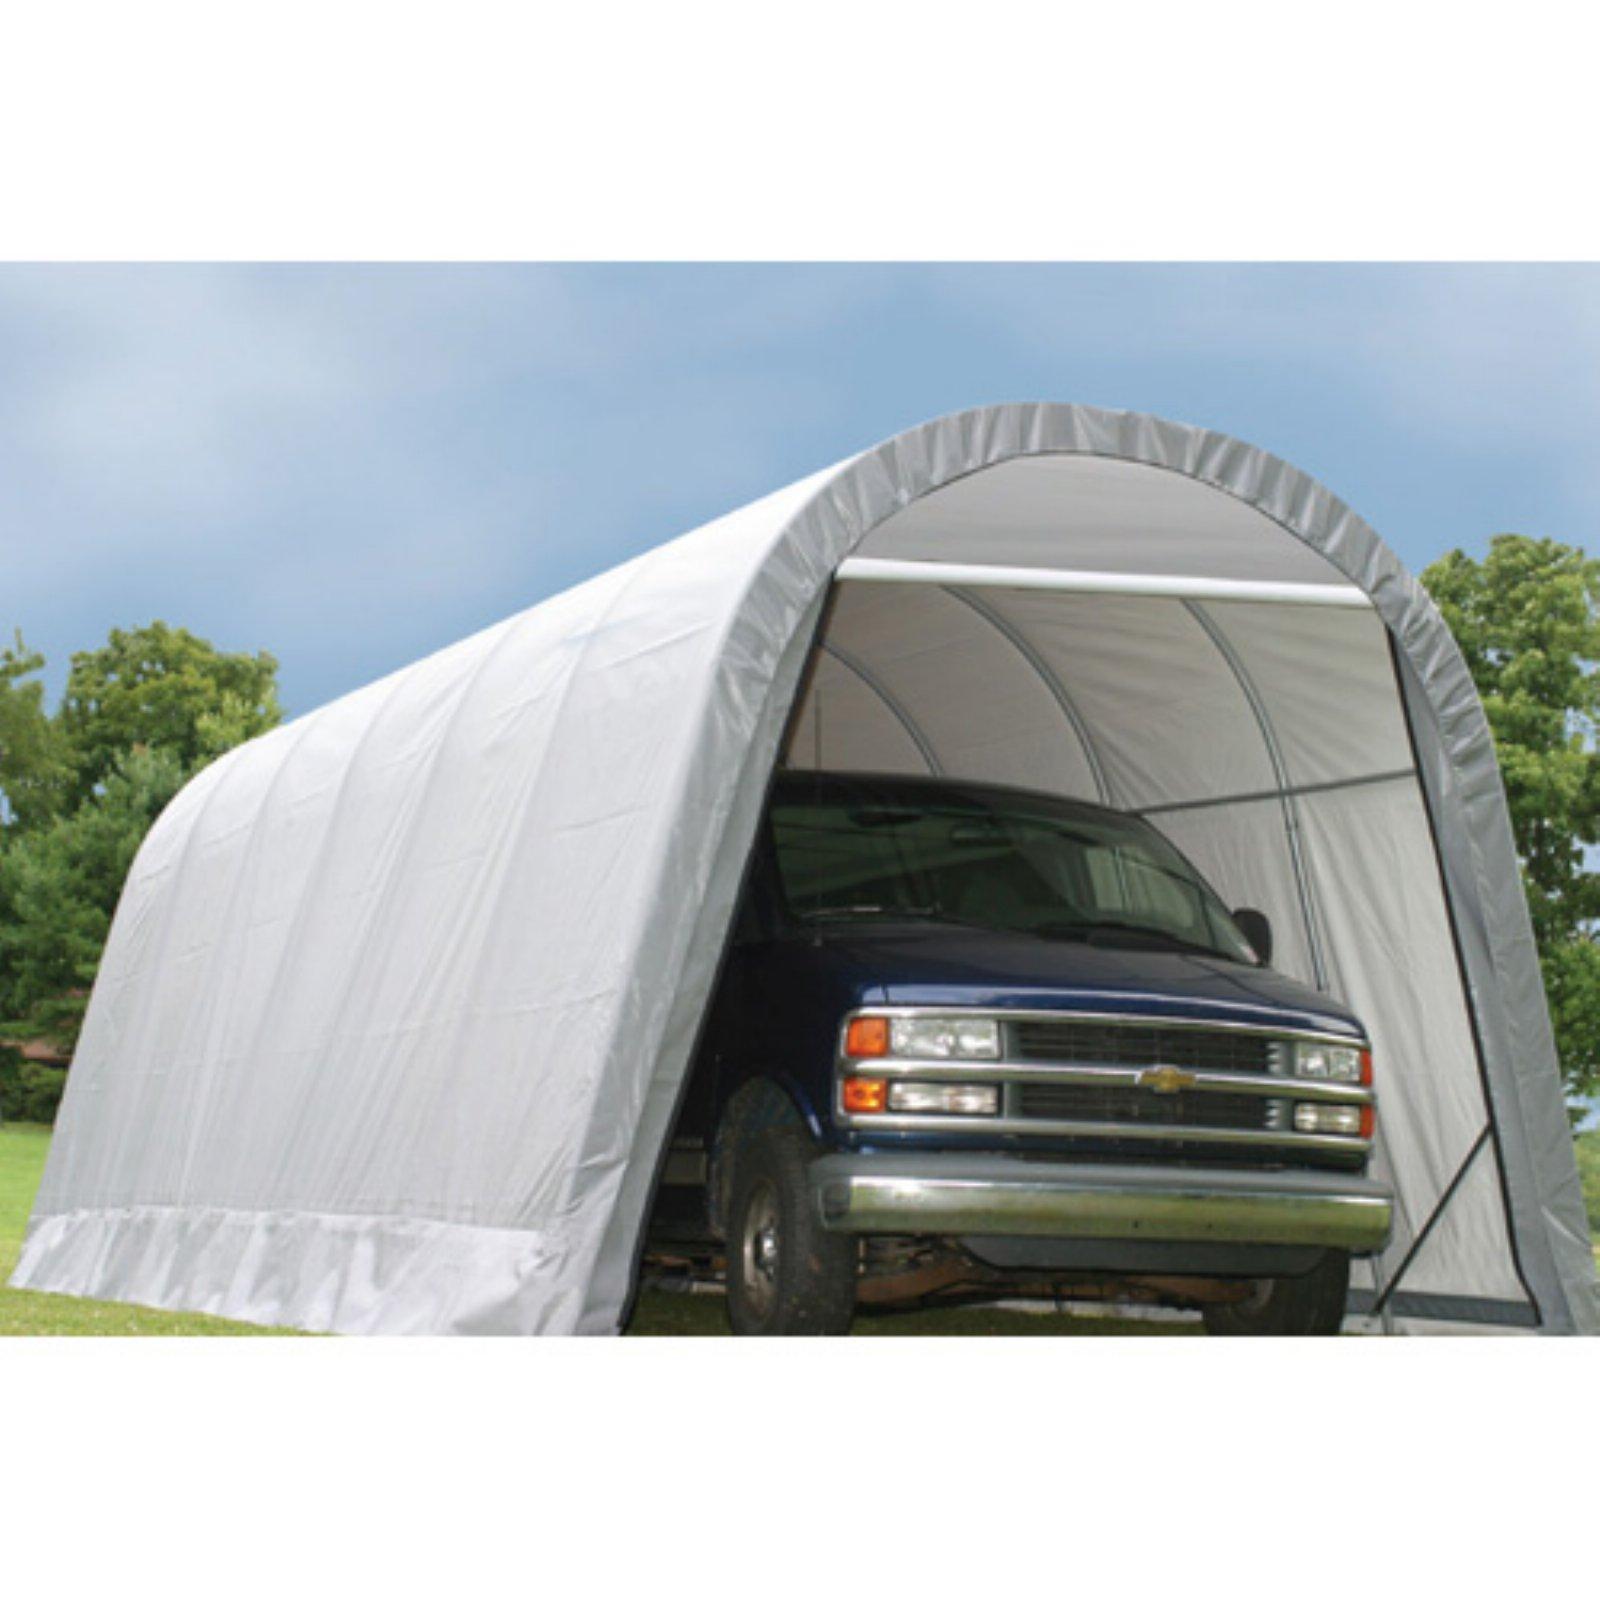 ShelterLogic 12 x 28 x 10 ft. Round Top Canopy Carport